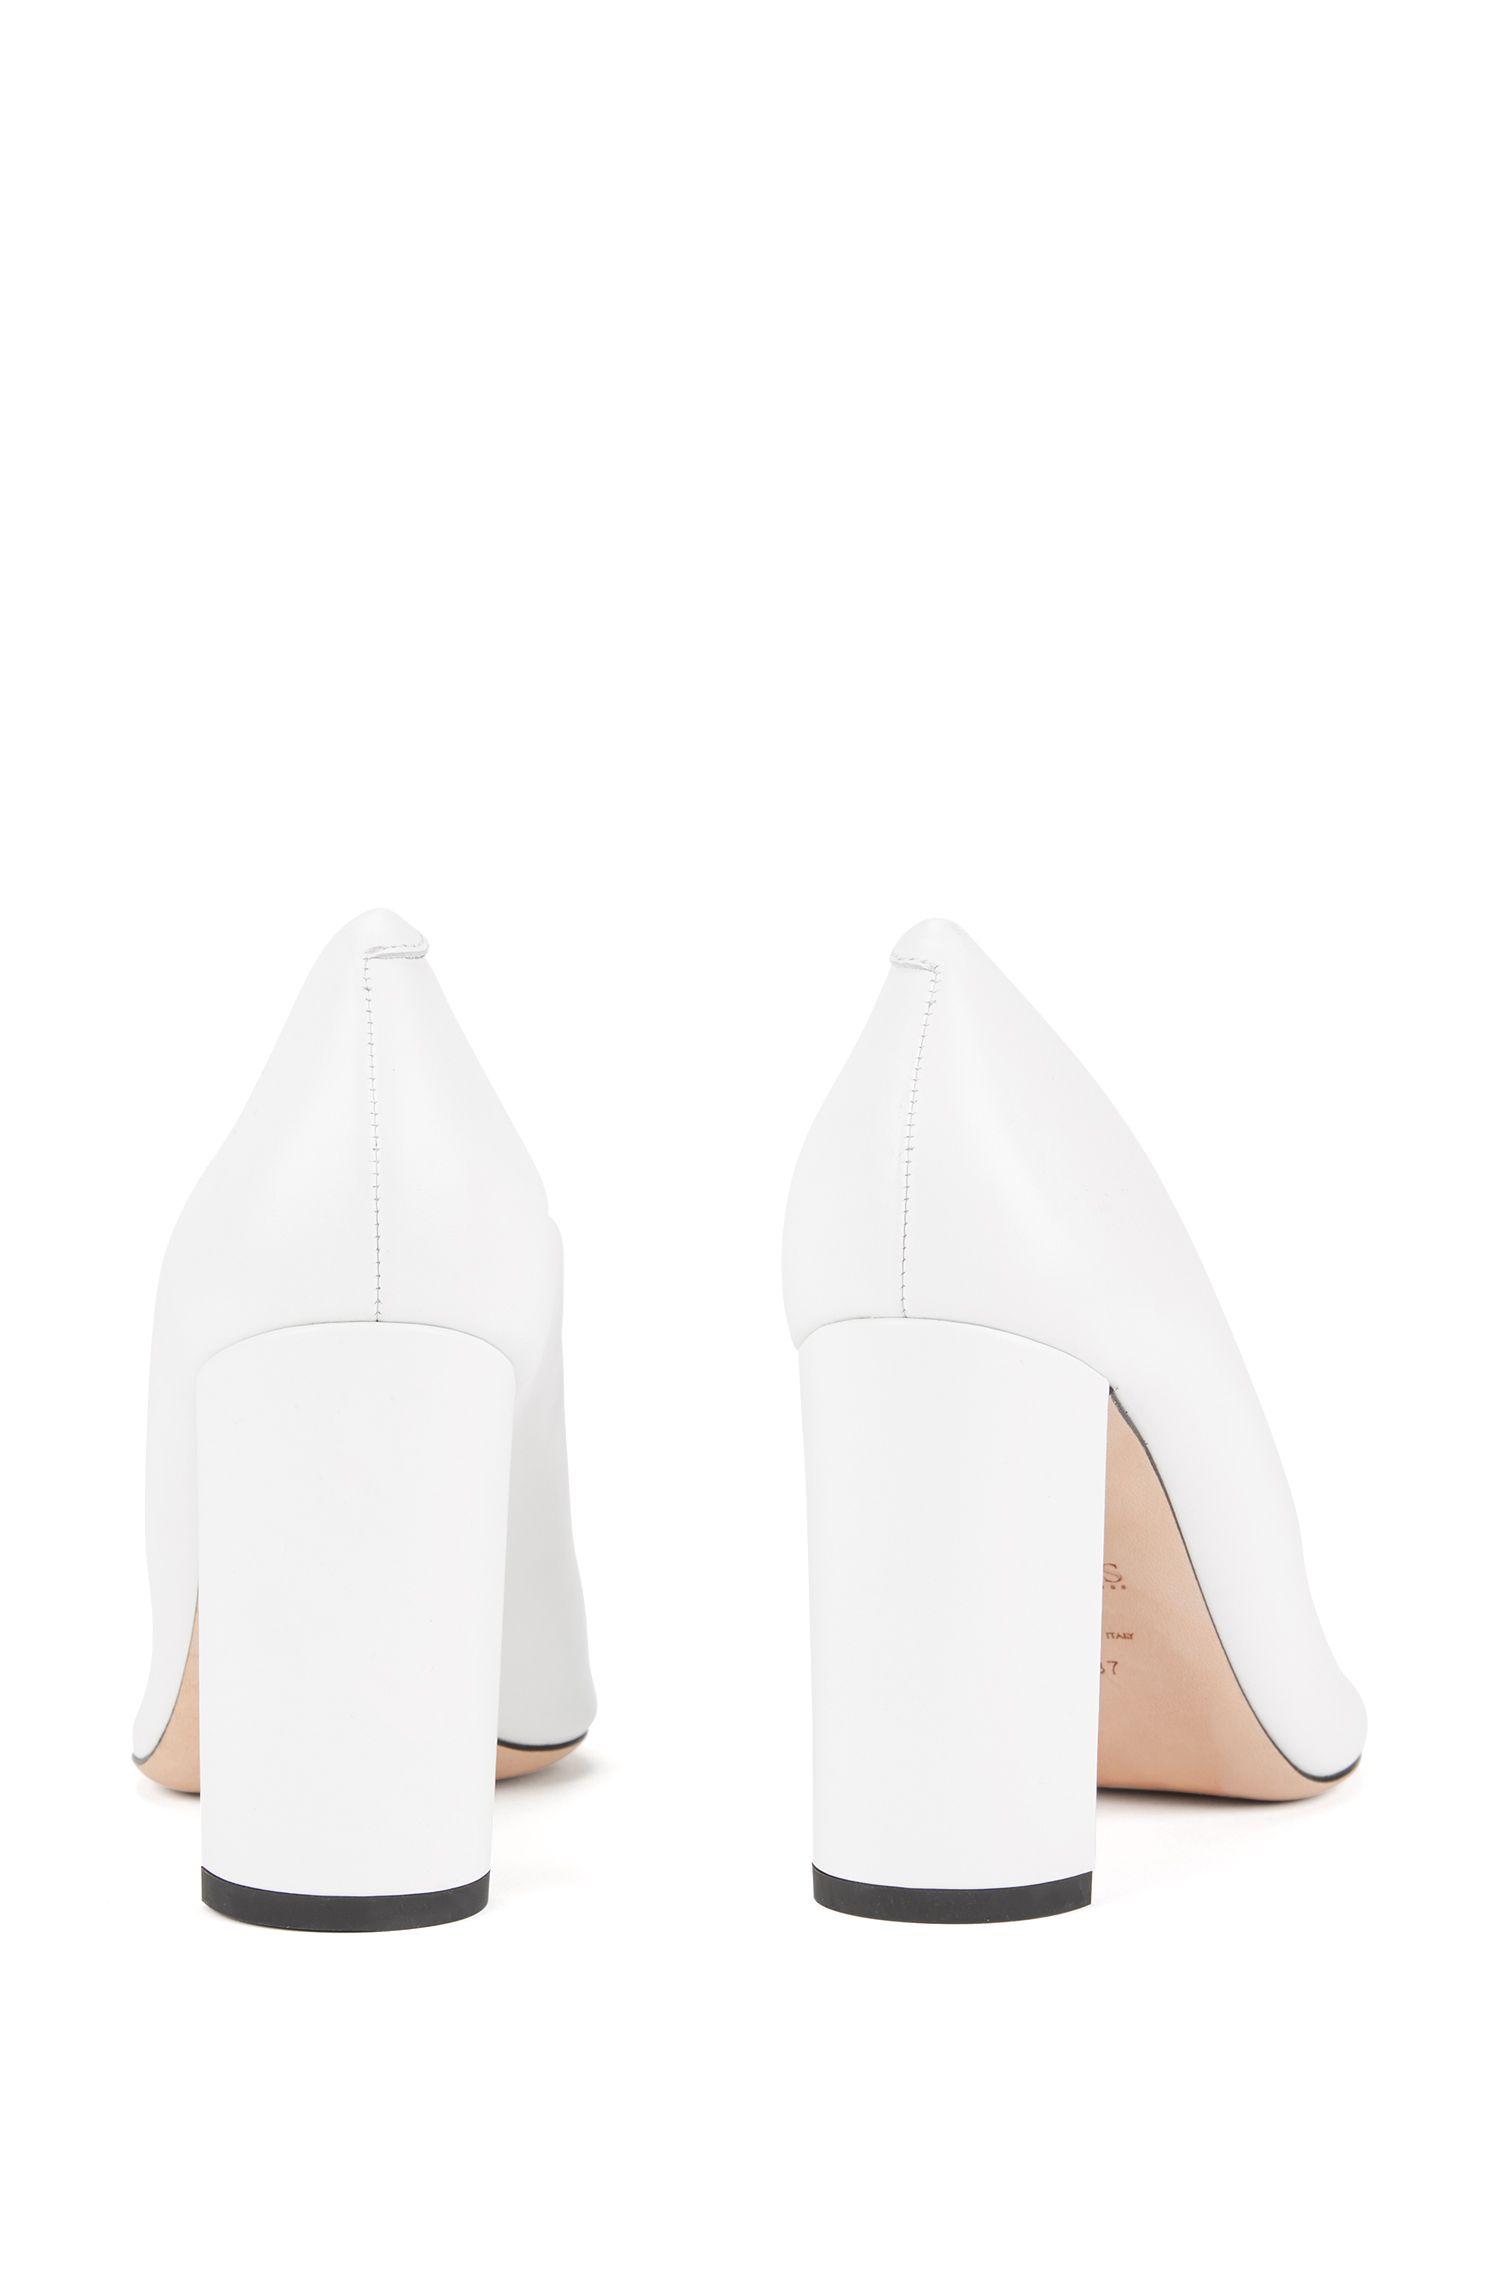 Lederpumps mit neun Zentimeter hohem Blockabsatz, Weiß